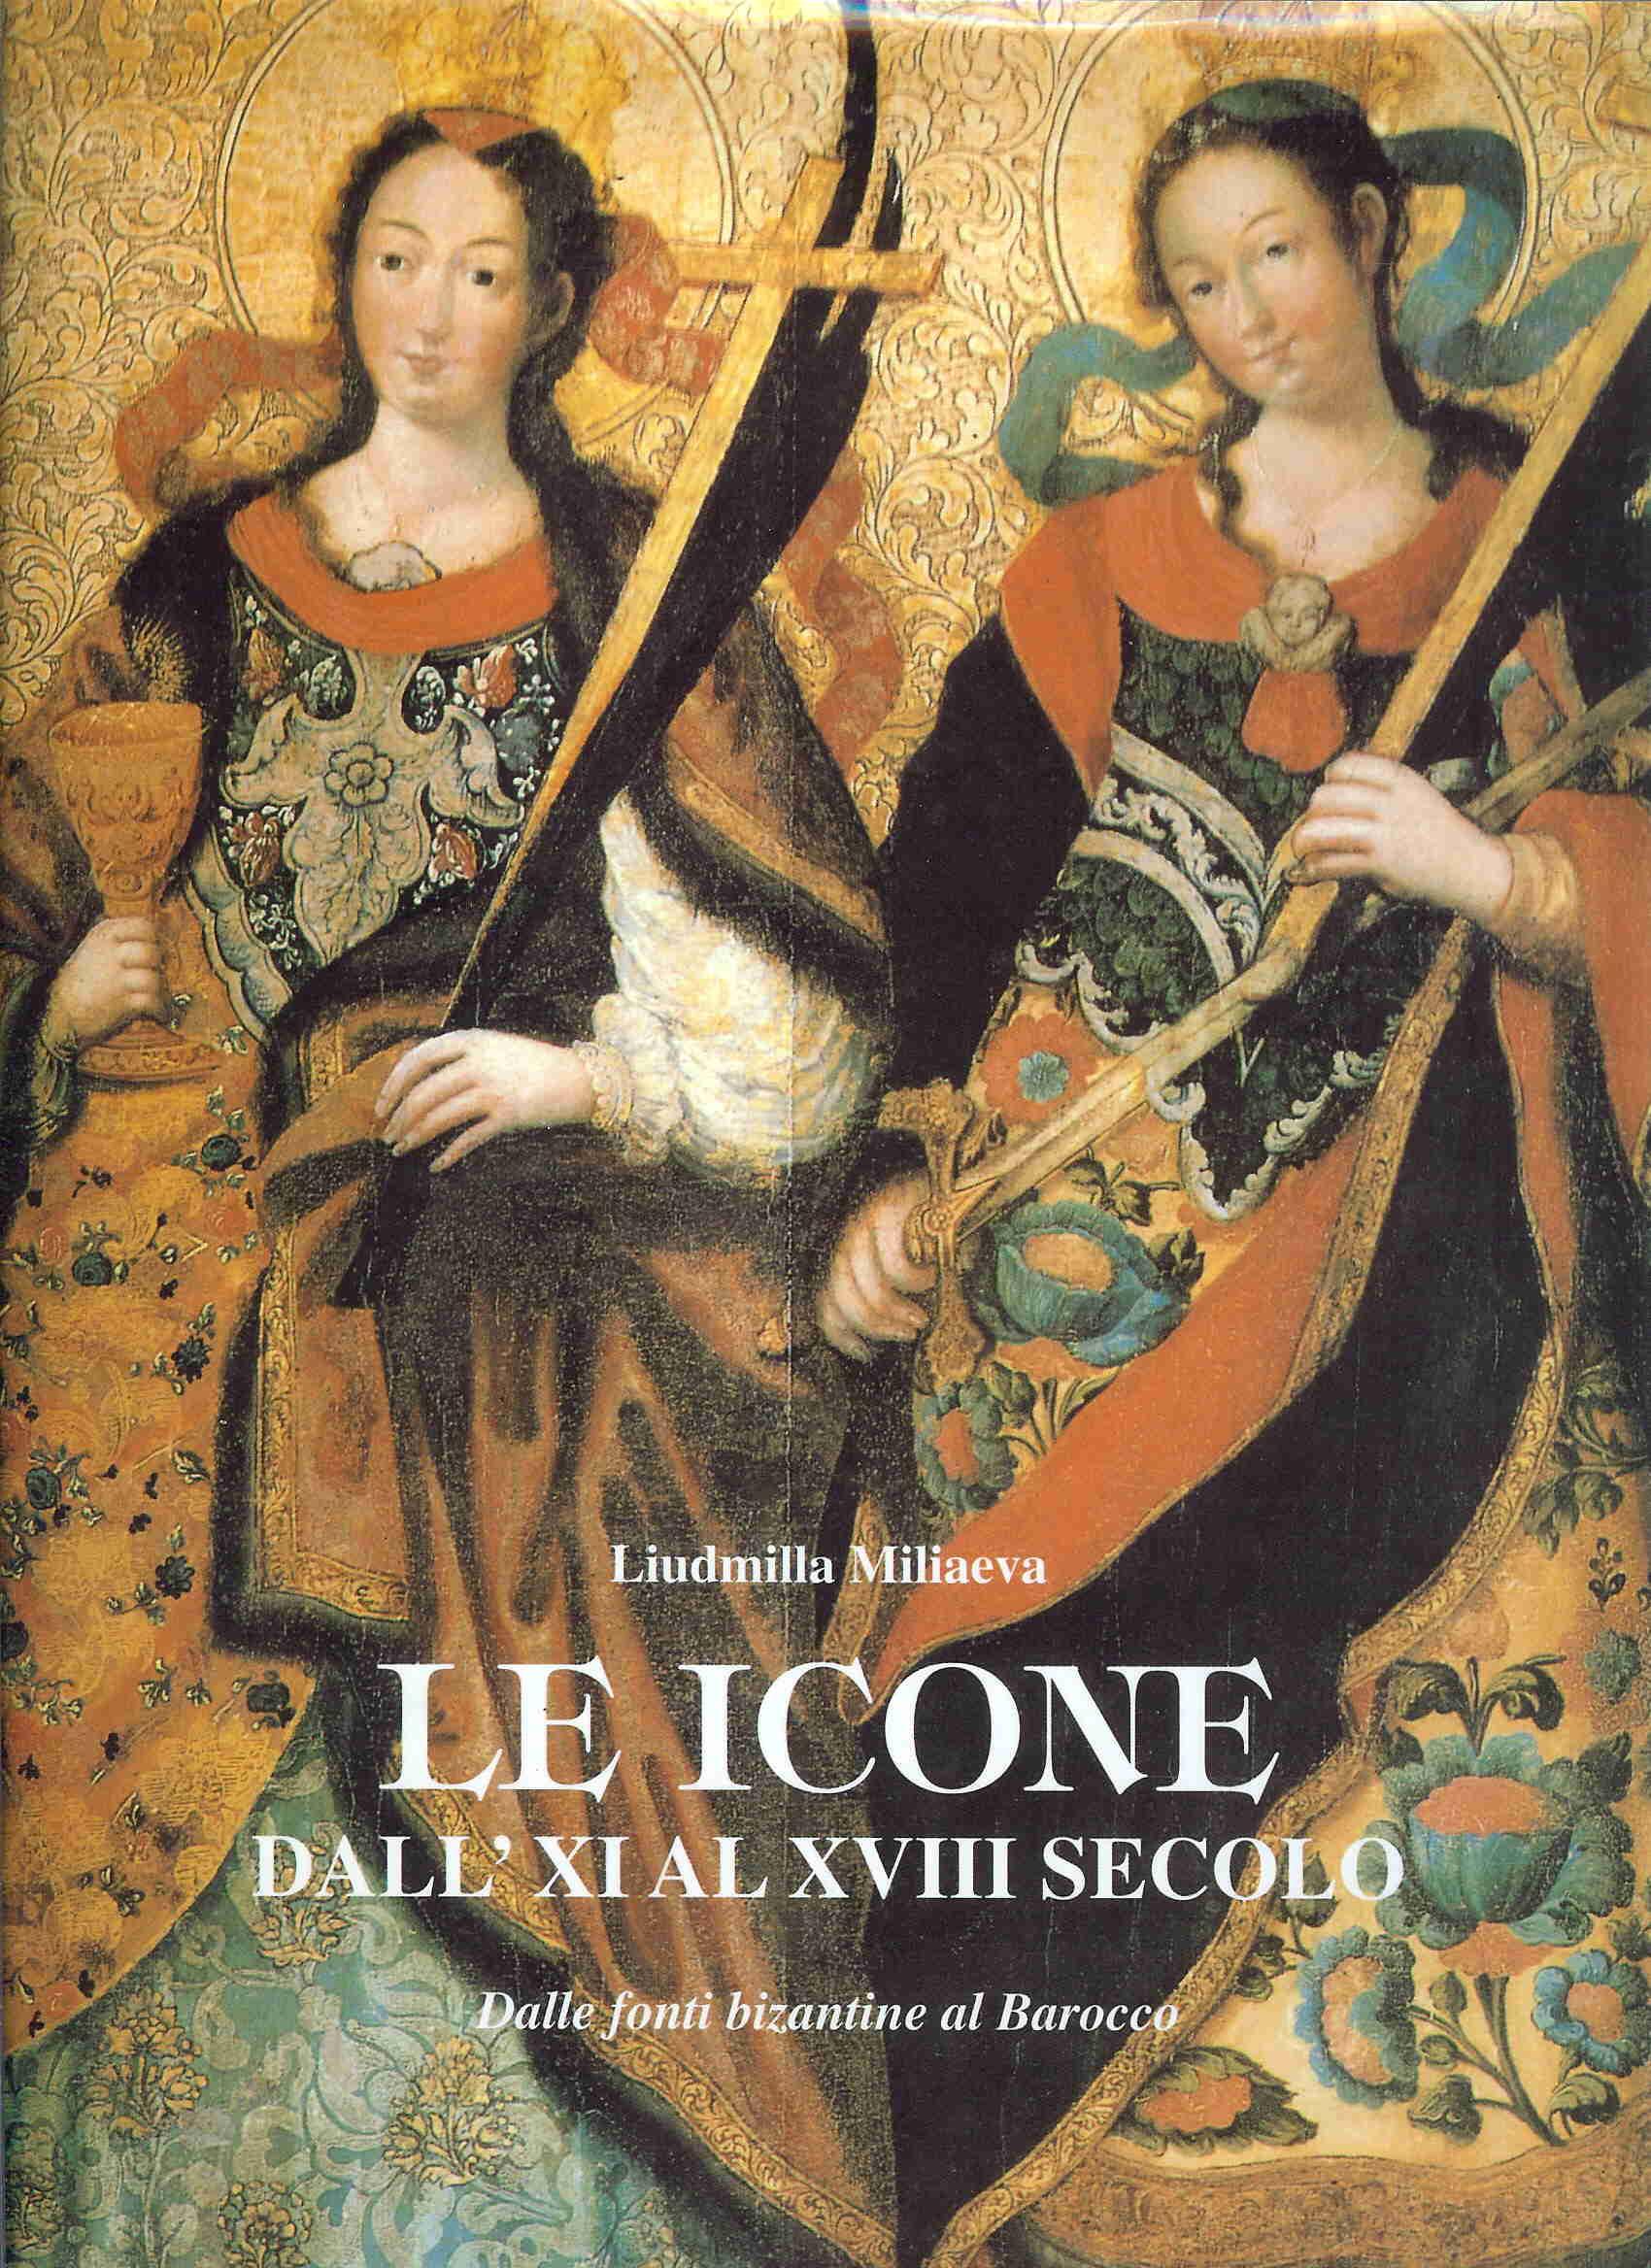 Le icone dall'XI al XVIII secolo